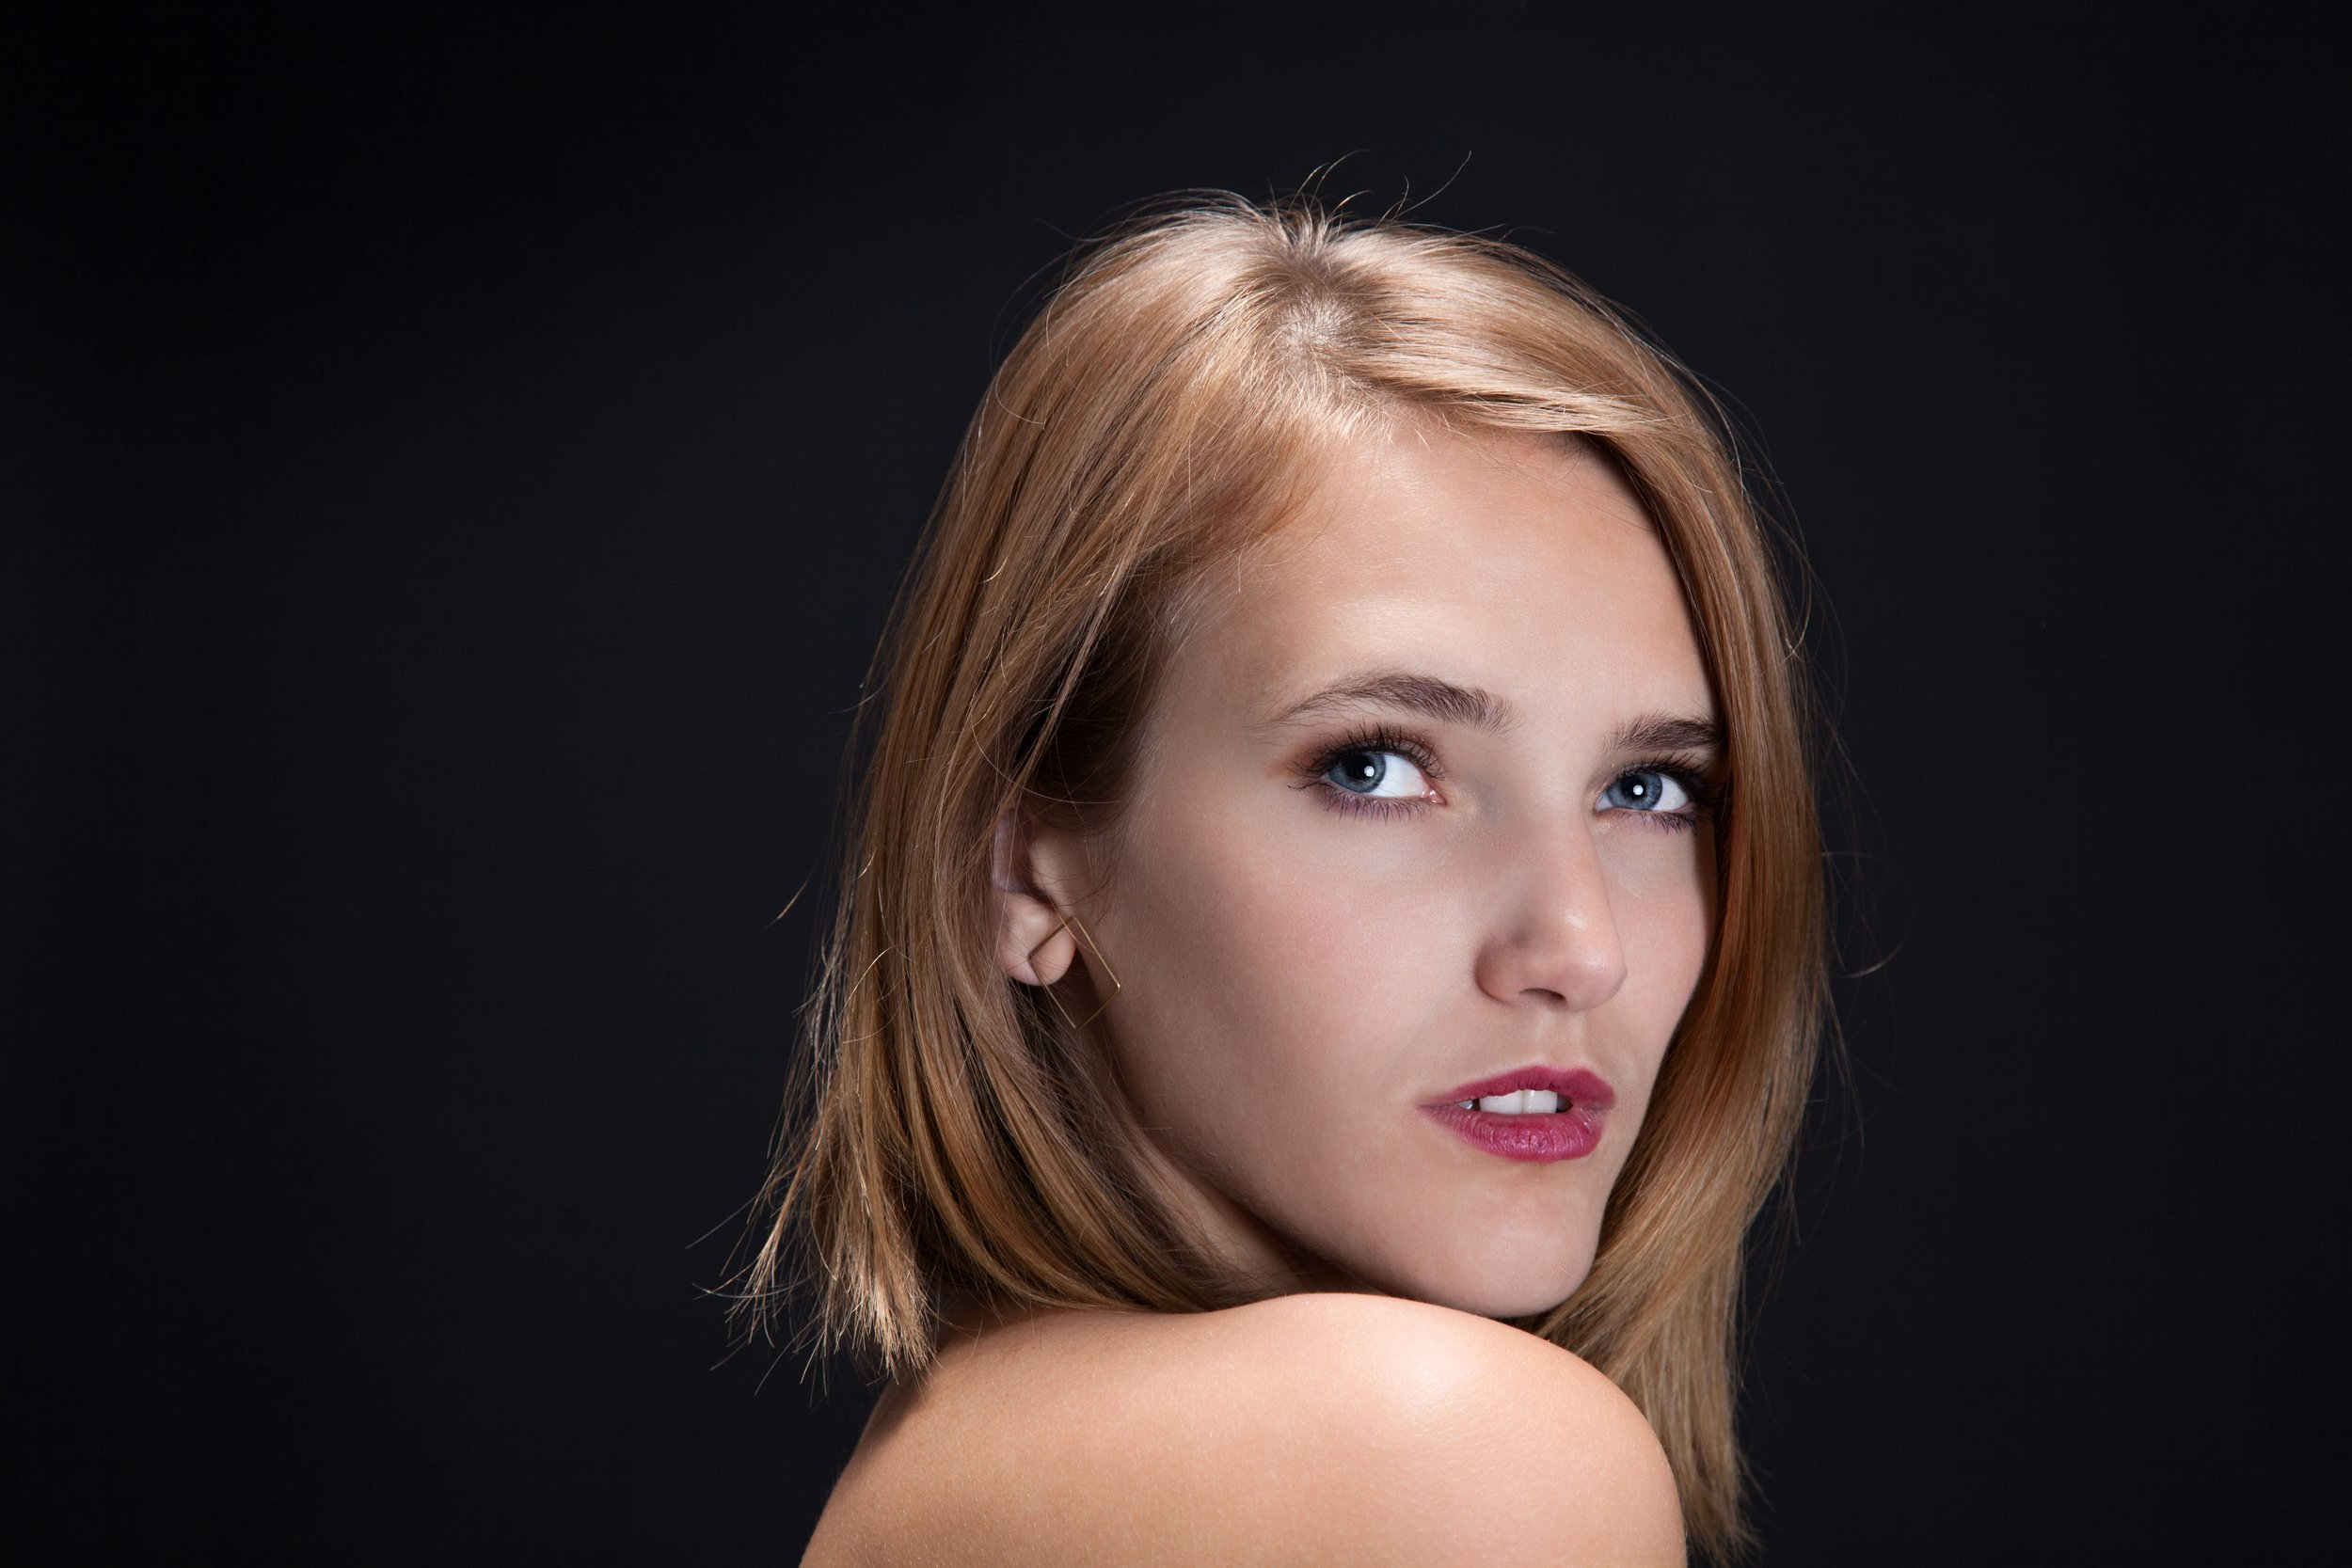 blonde portrait_pp.jpg